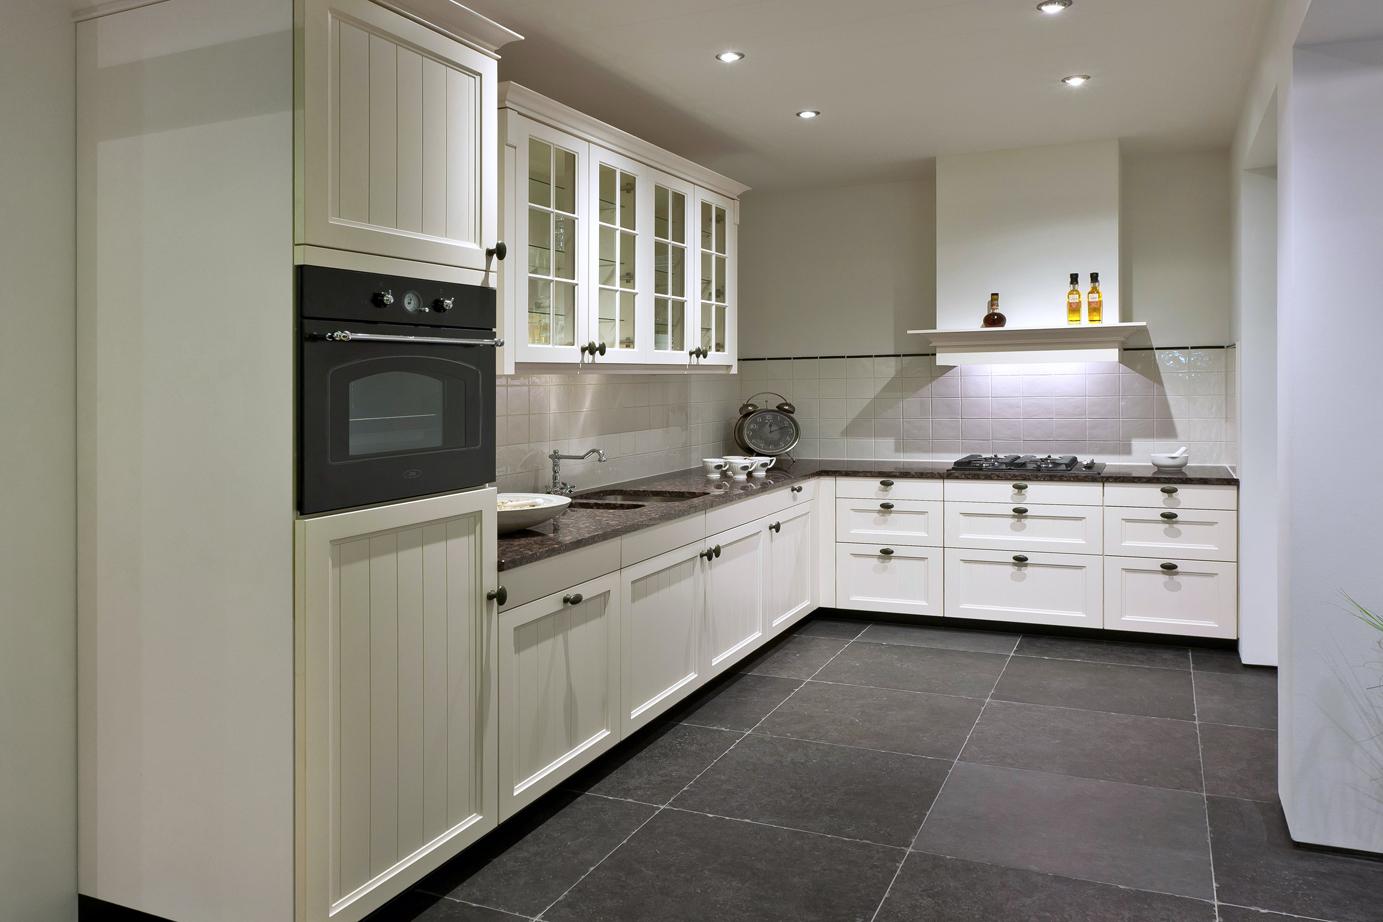 Keuken Wit Landelijk – Atumre.com